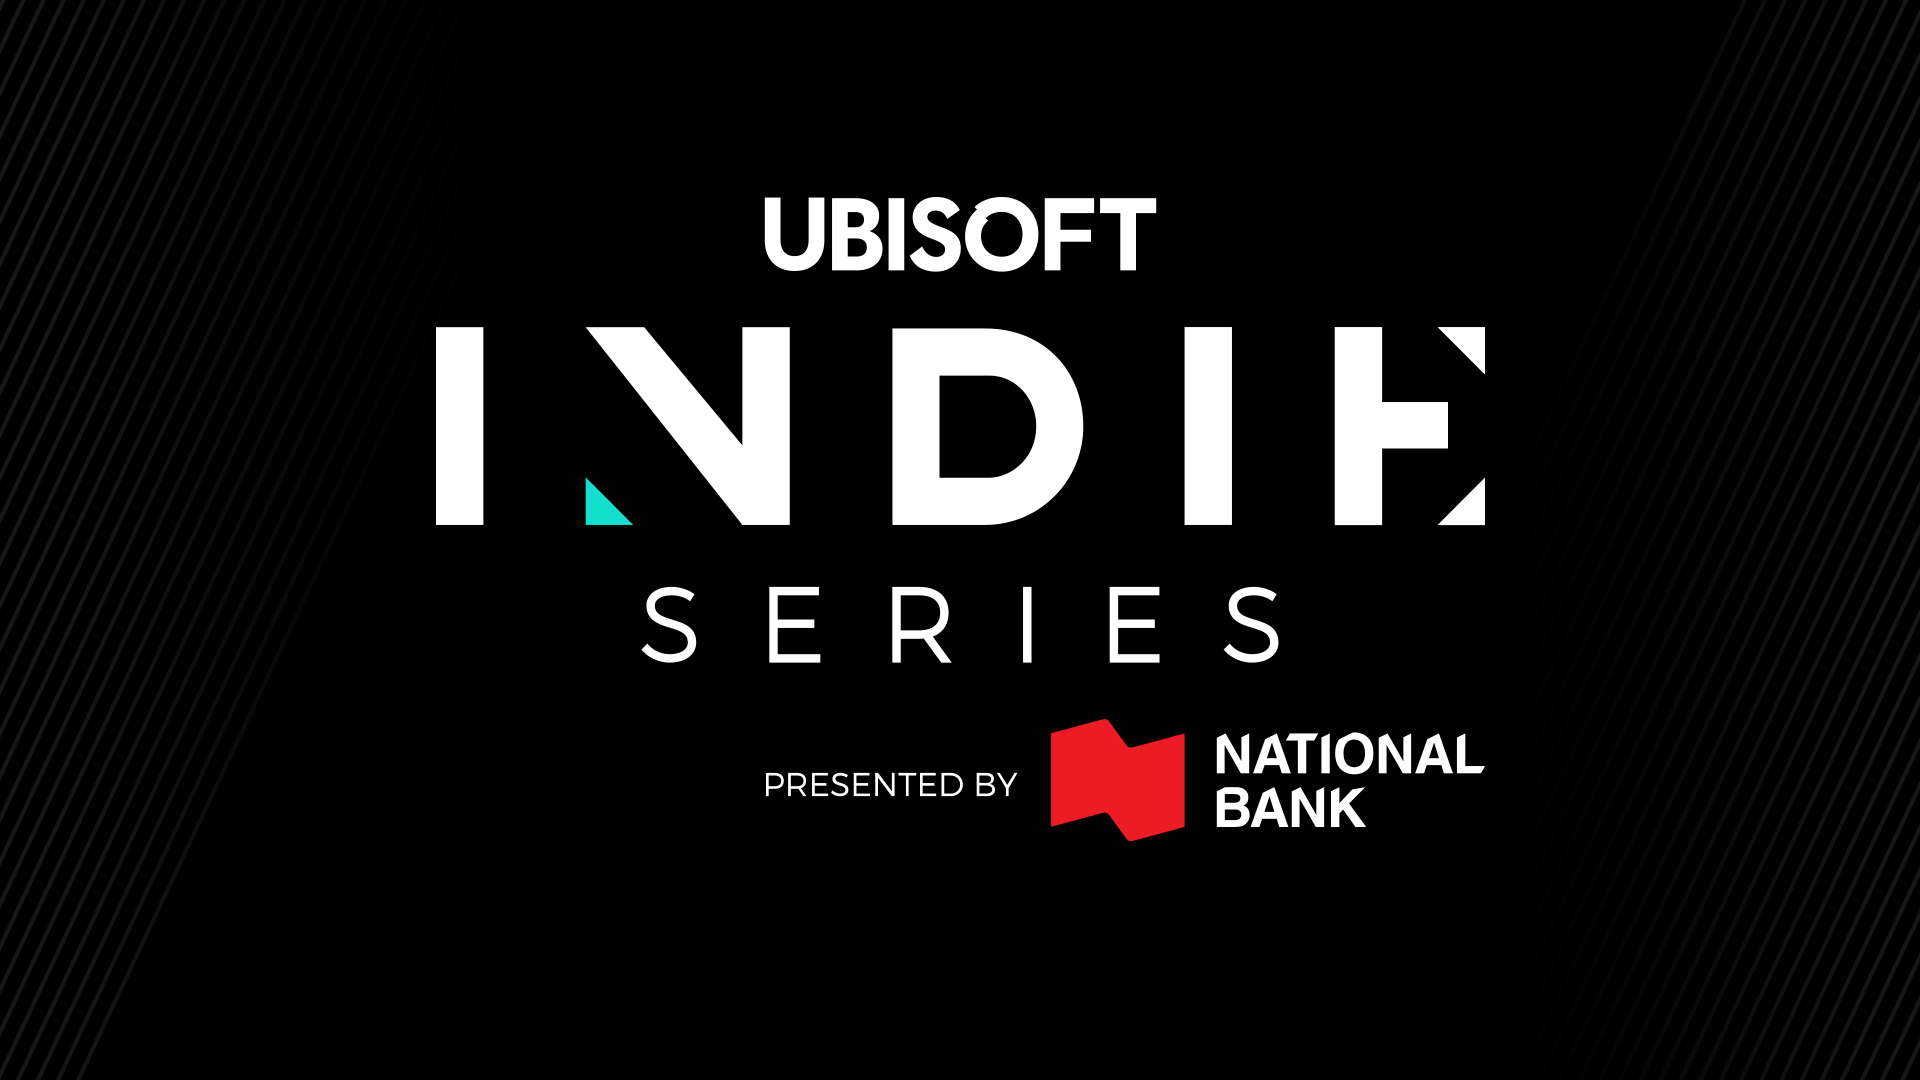 The 2020 Ubisoft Indie Series Finalists